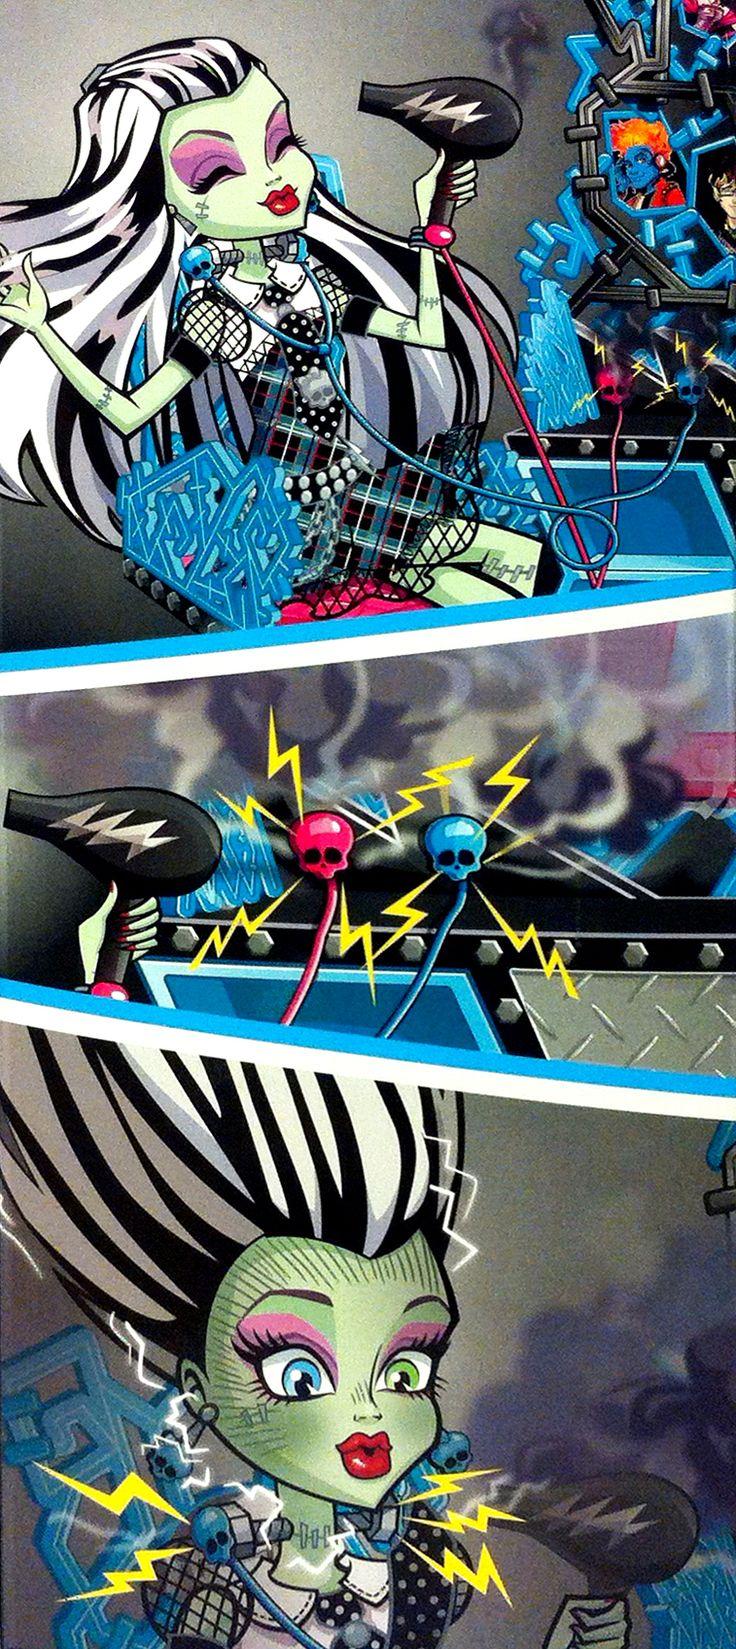 Todo sobre Monster High: Nueva imagen de Frankie Stein